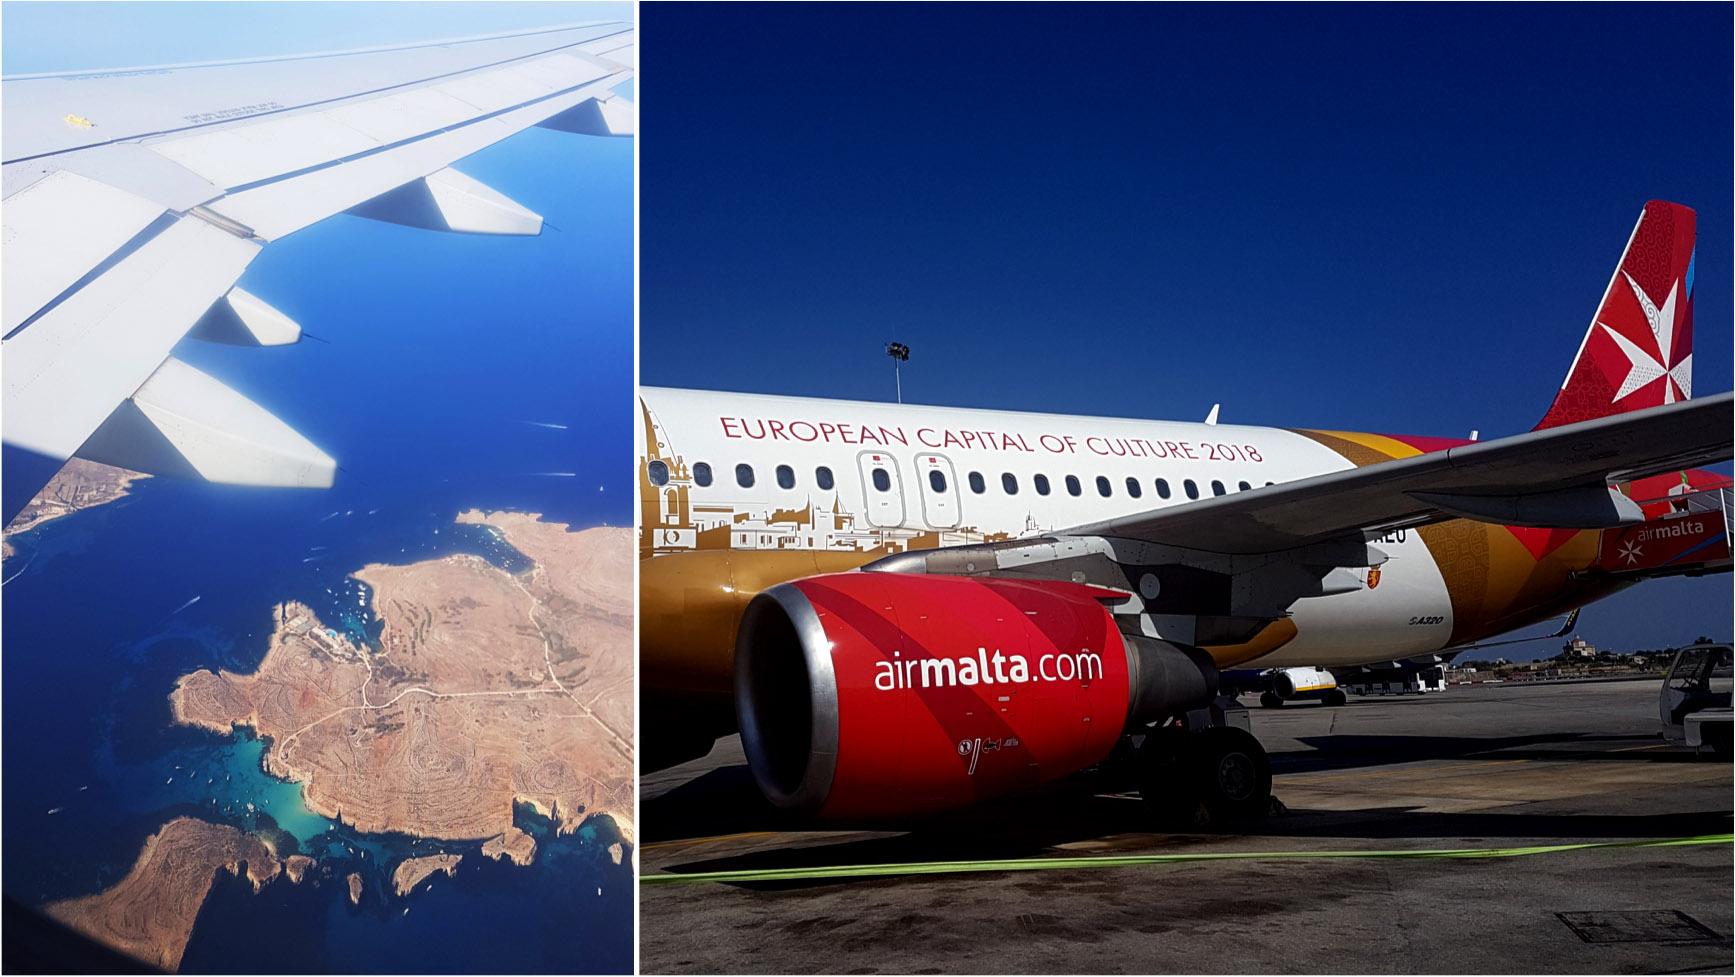 Vista aérea da ilha de Comino / Blue Lagoon & Aeronave da Air Malta